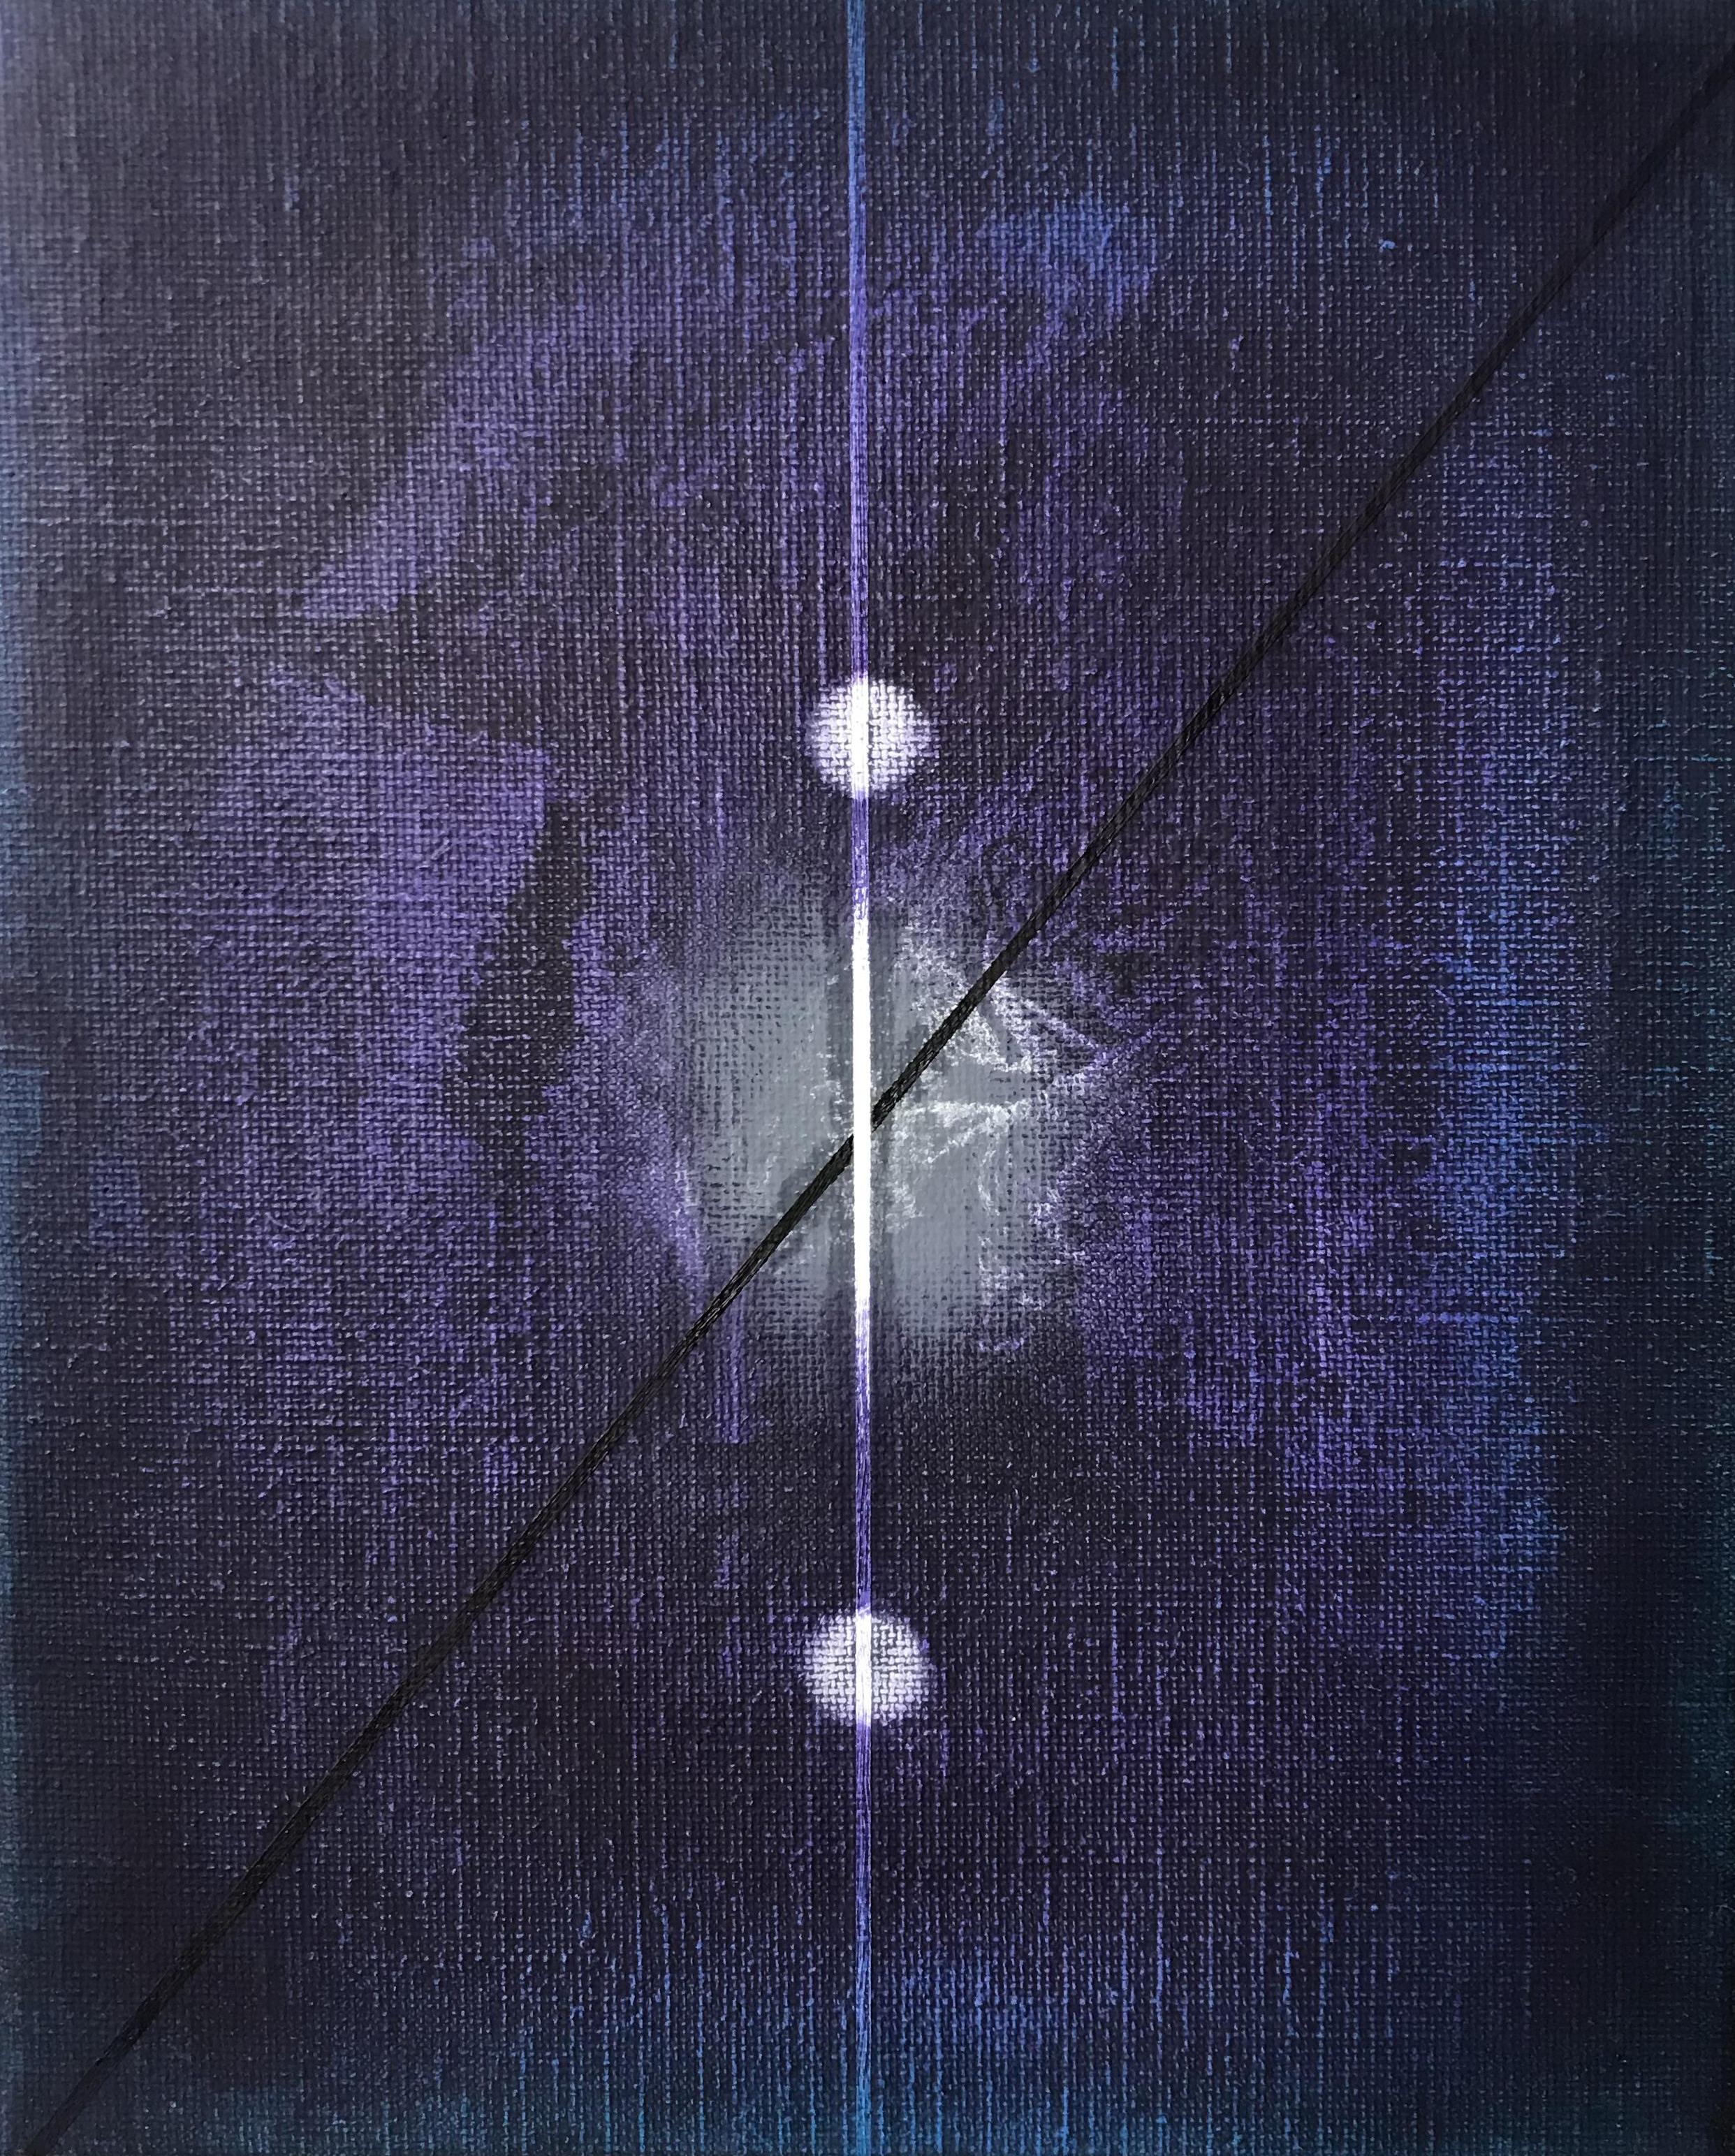 Miquel Gelabert: Strangers in the Night 3, oil on canvas, 10.5 x 8.5 in., 2018